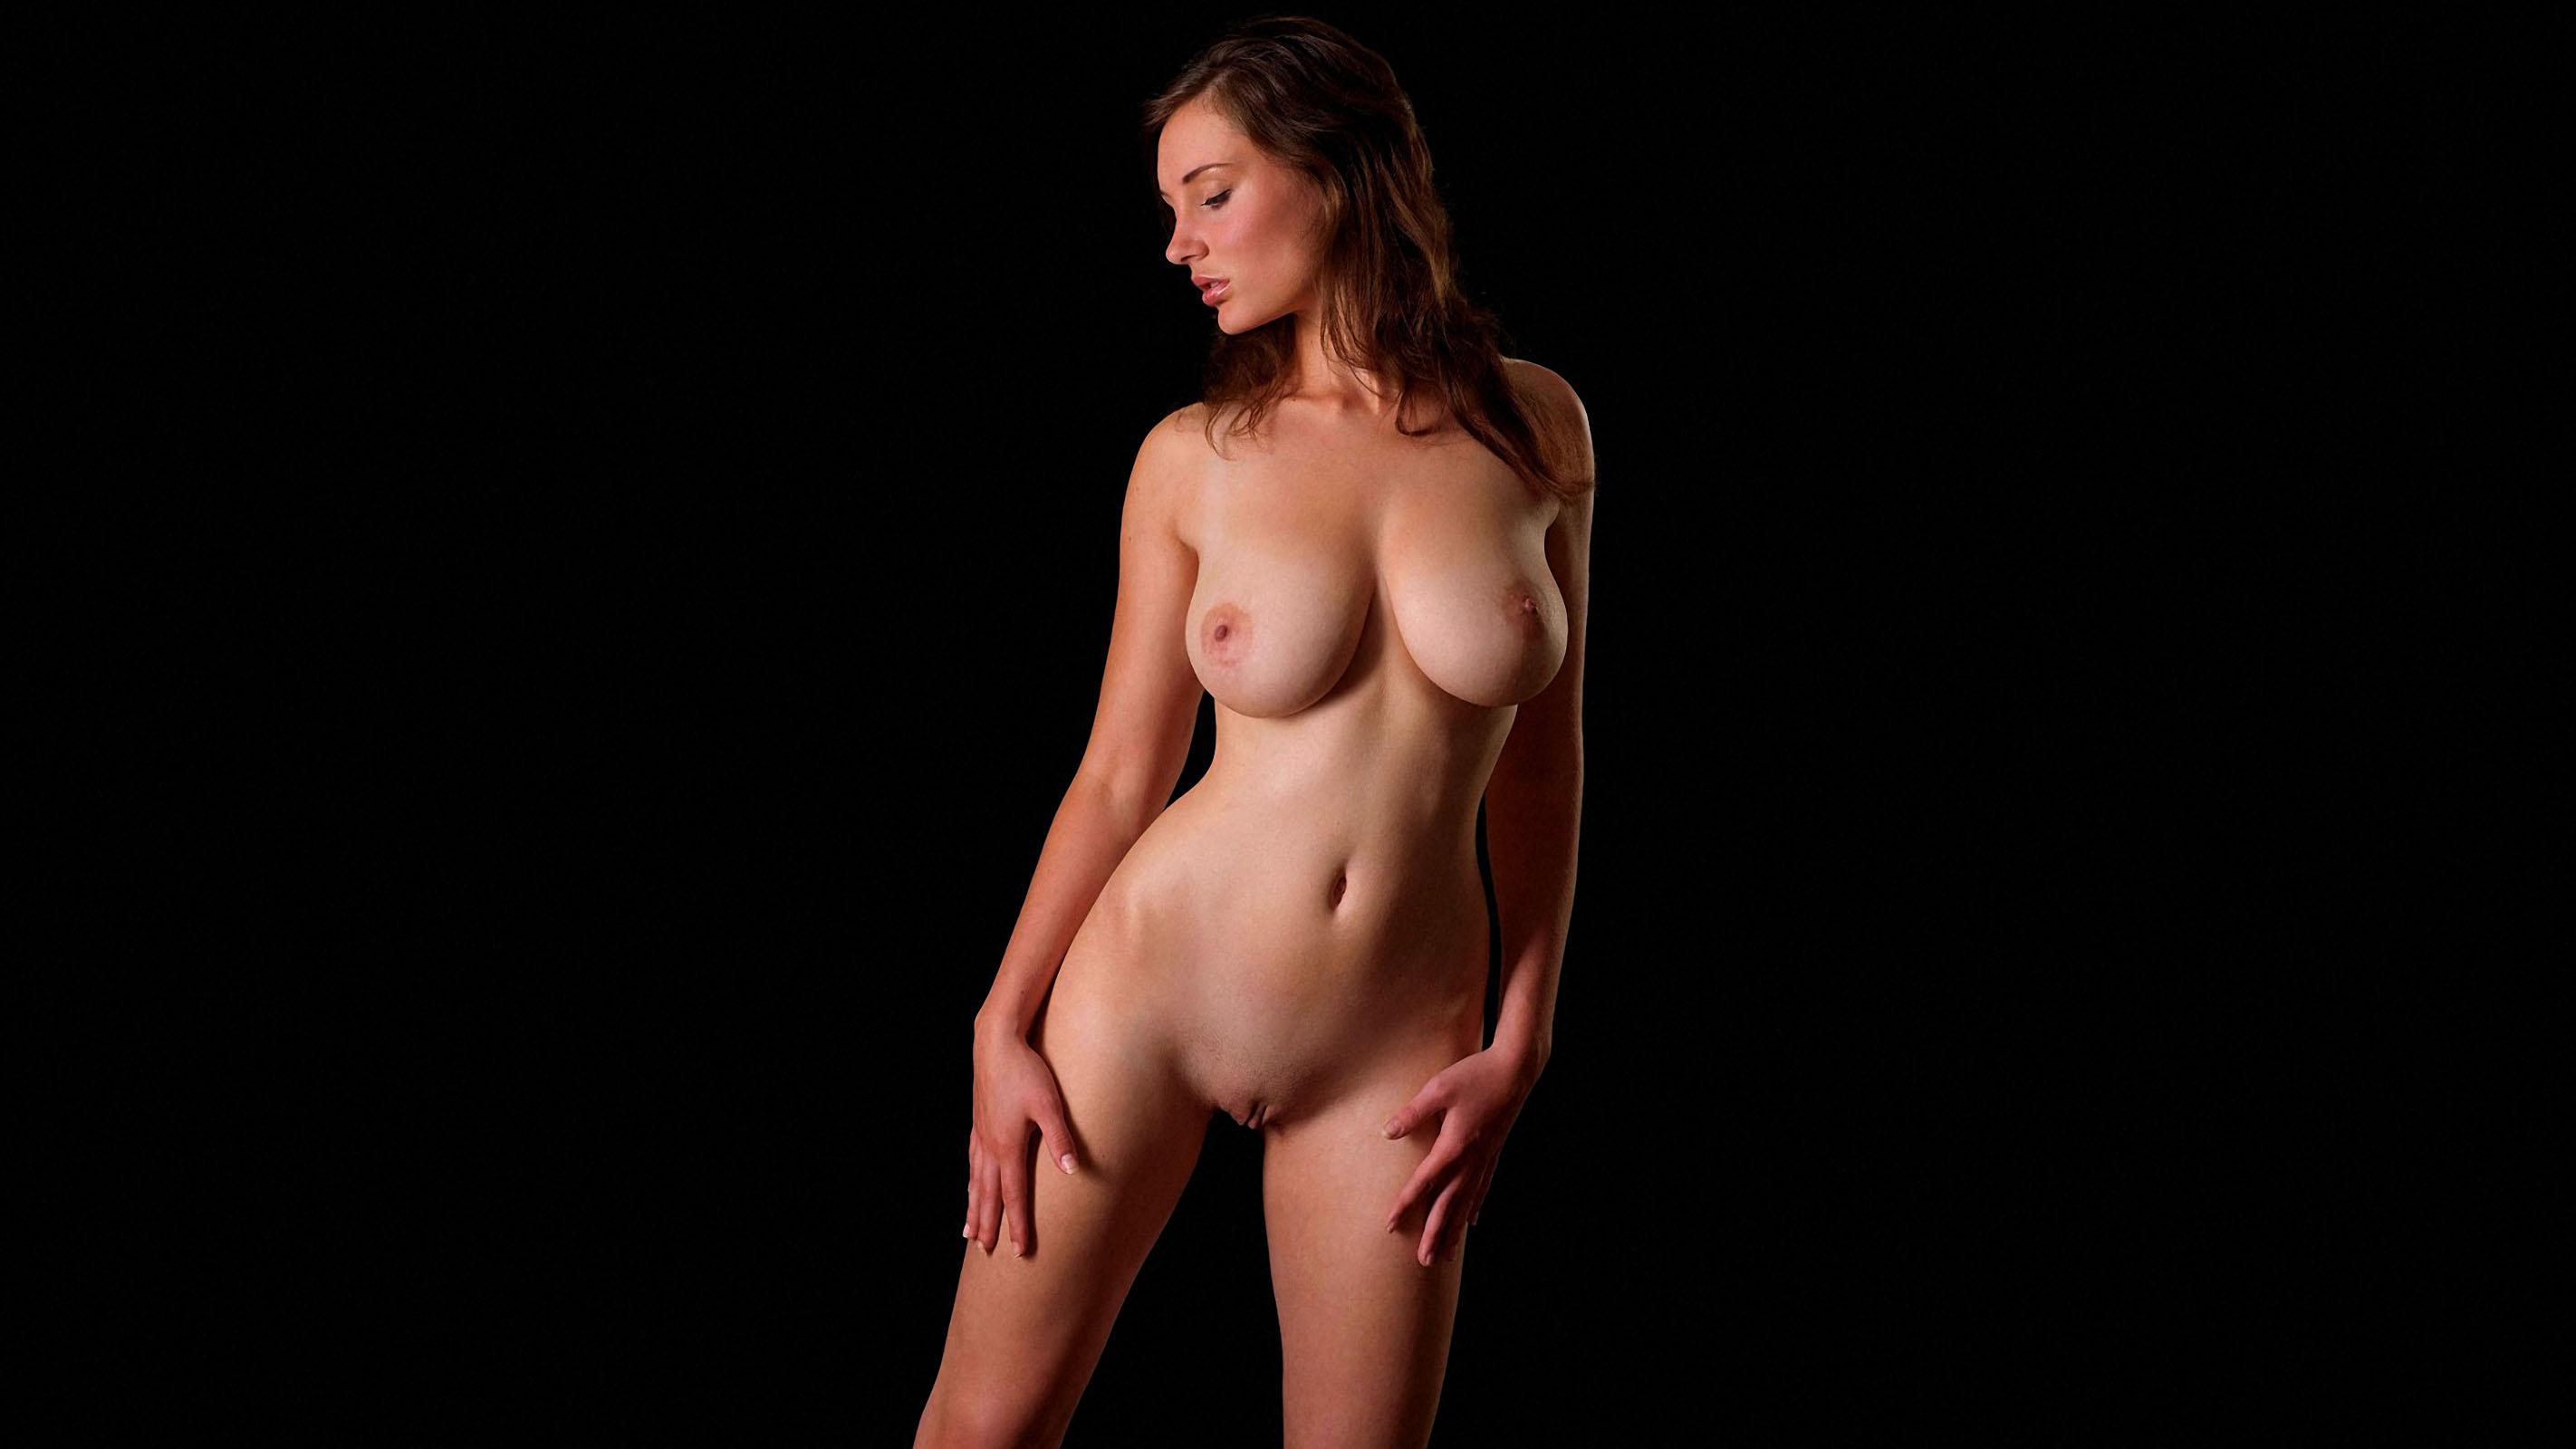 Hot ex girls nude